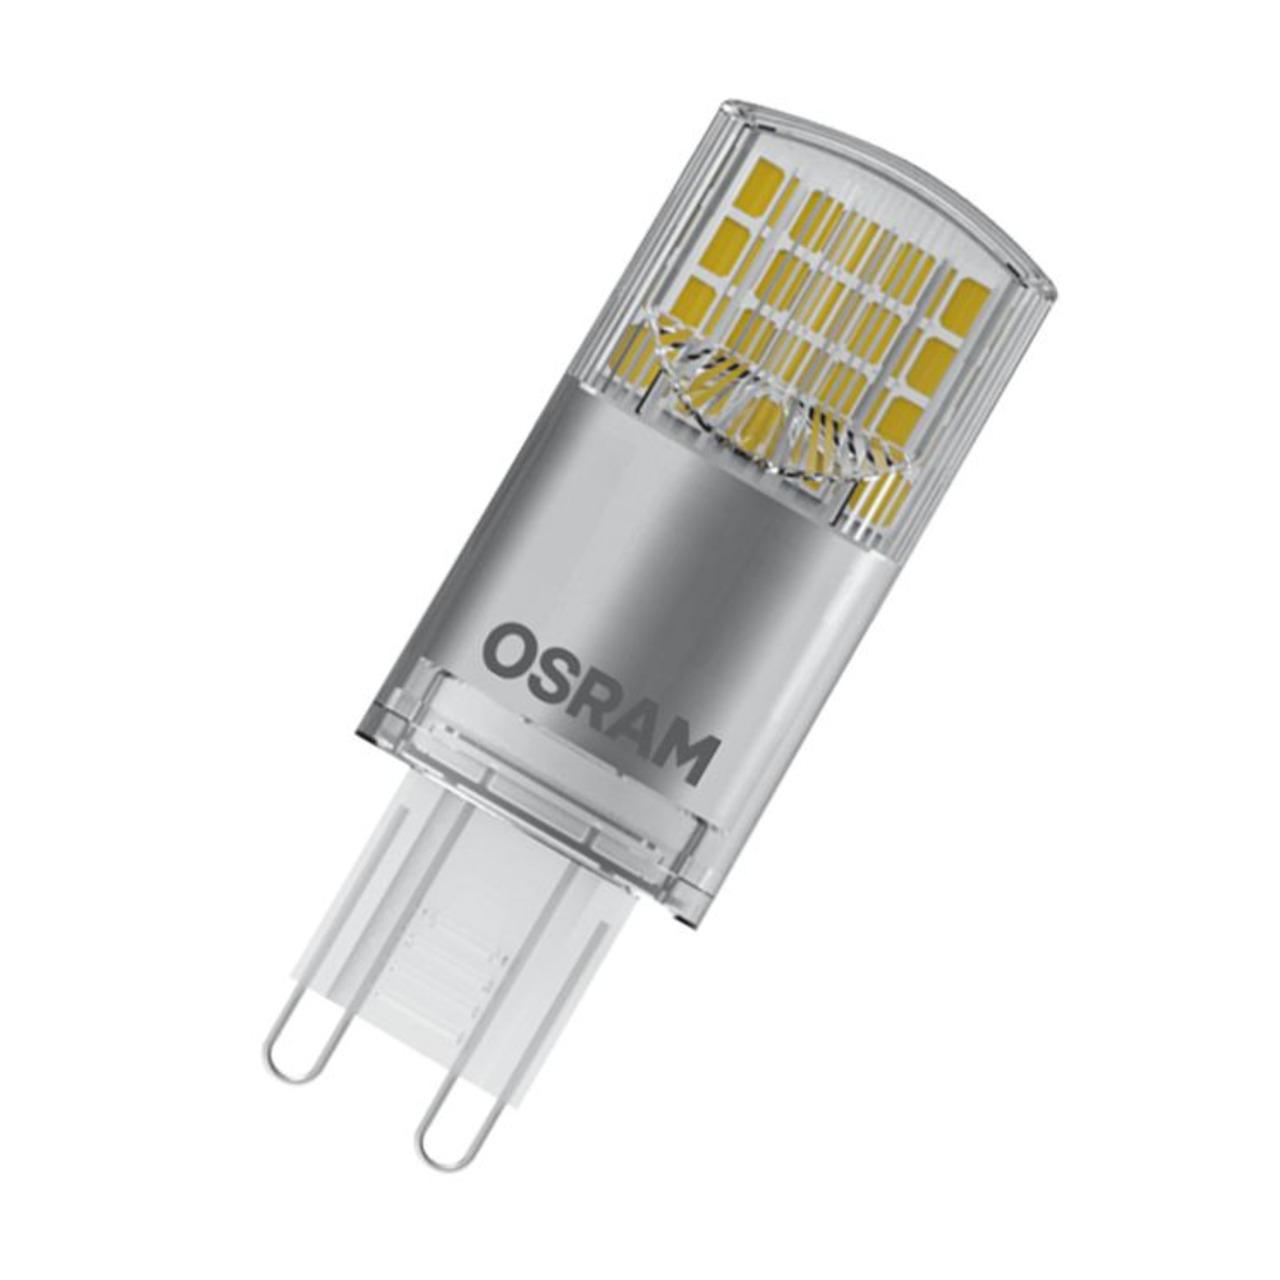 OSRAM 4-2-W-LED-Lampe T20- G9- 470 lm- neutralweiss